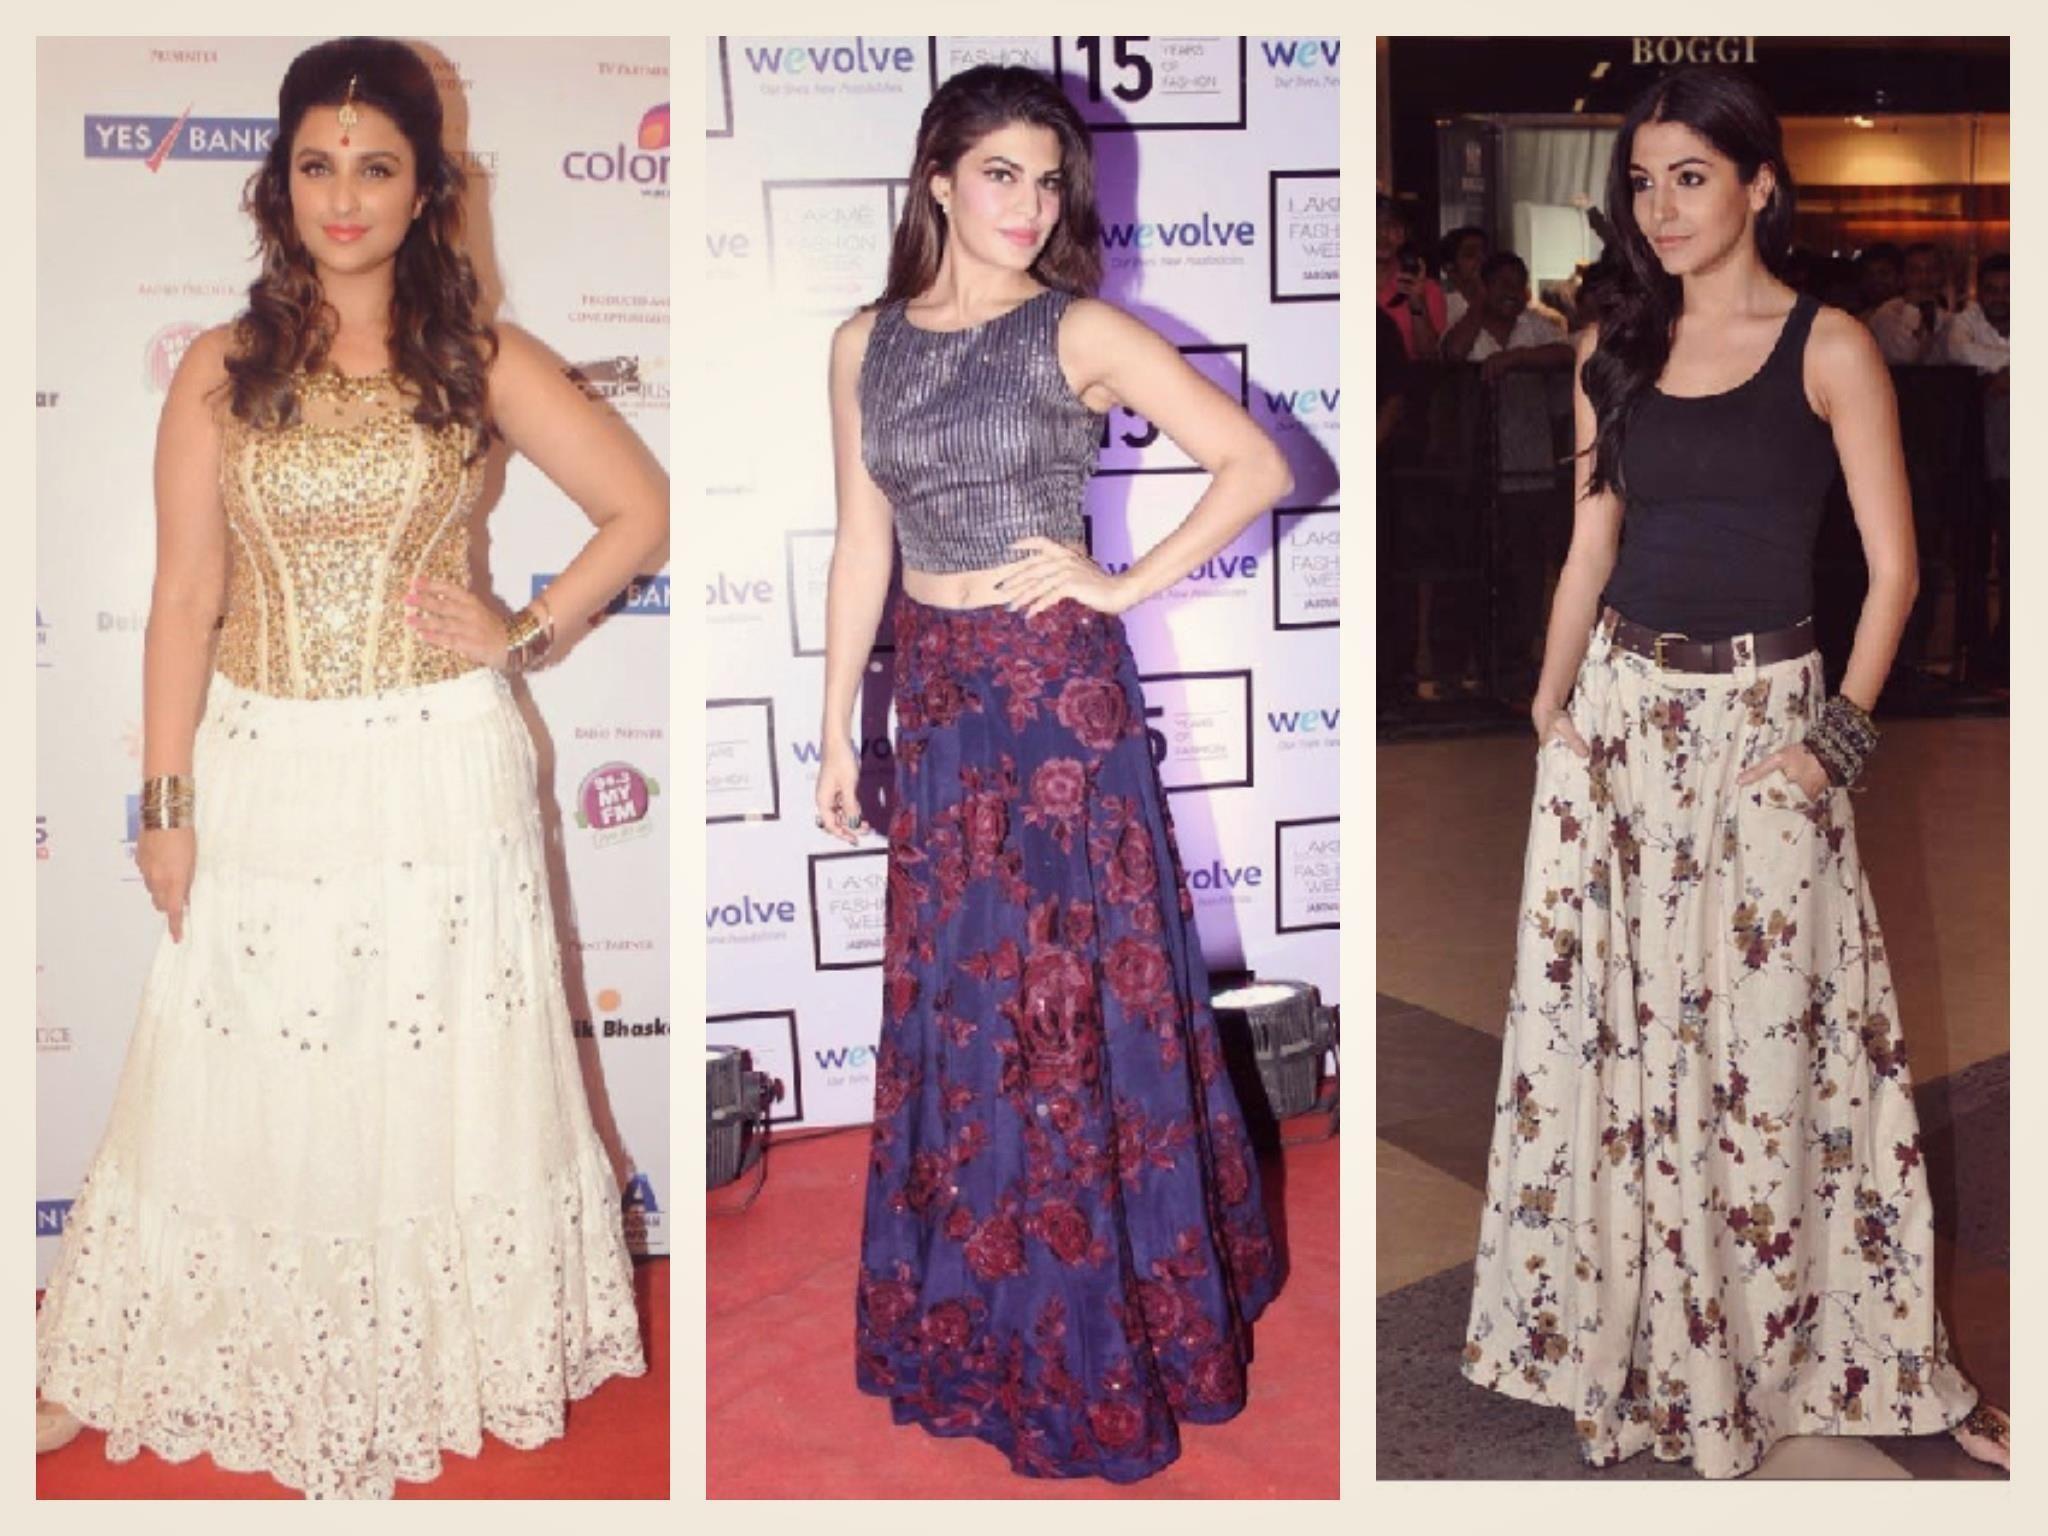 Bollywood Celebs In Long Skirts Jacqueline, Pariniti And Anushka